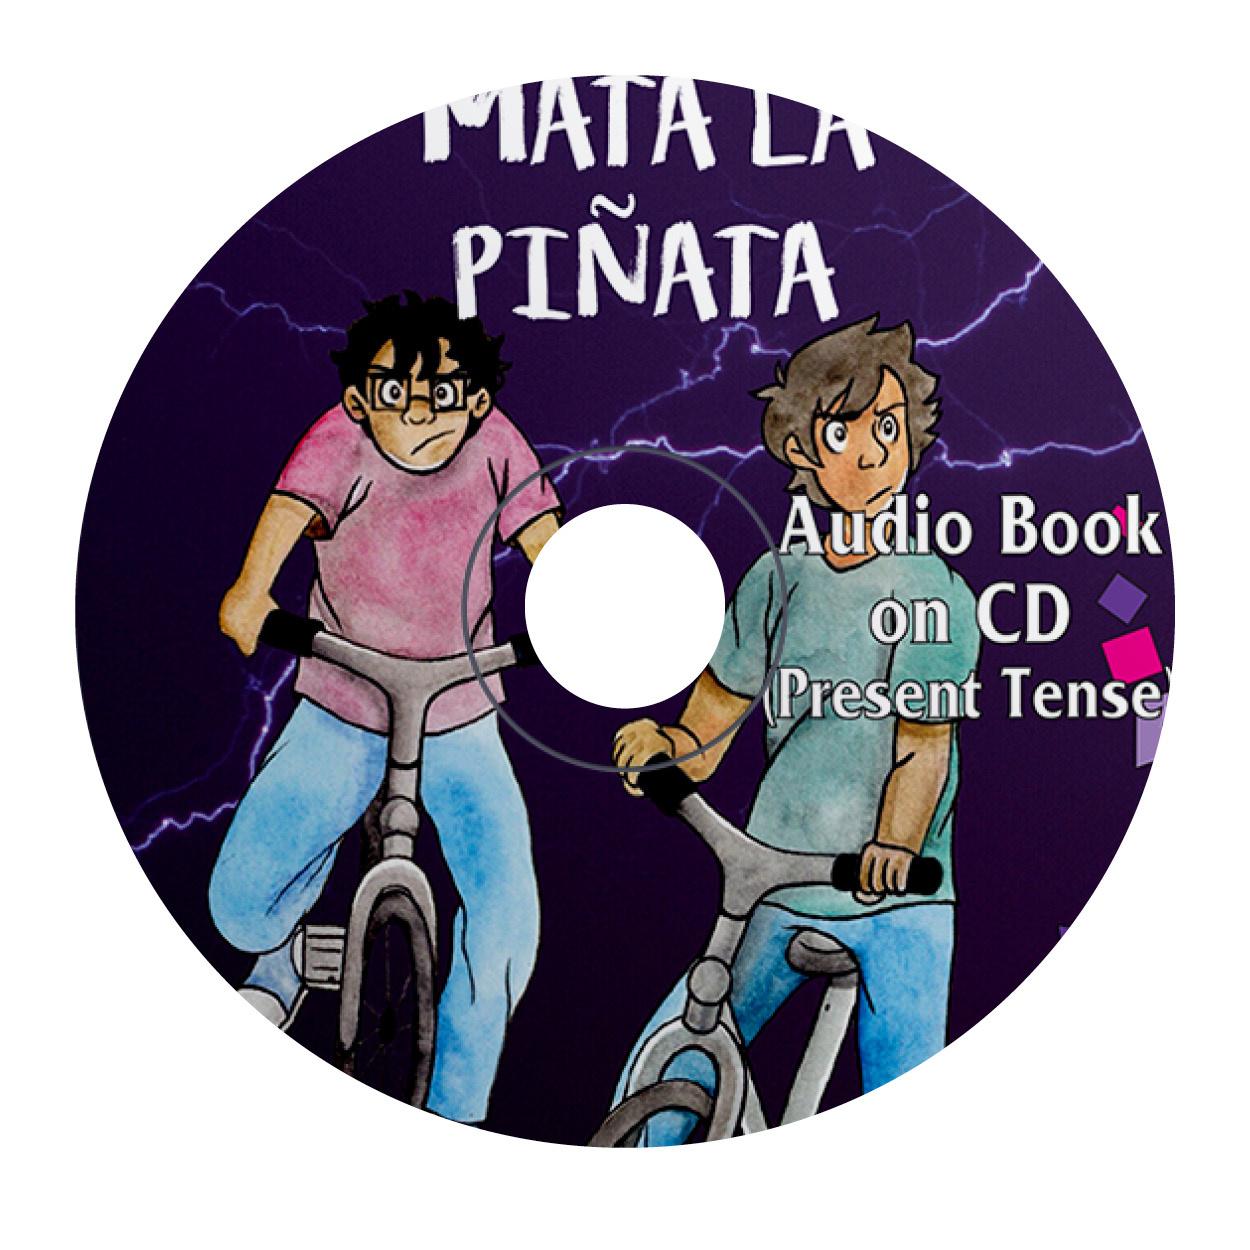 Mata la piñata - Audiobook